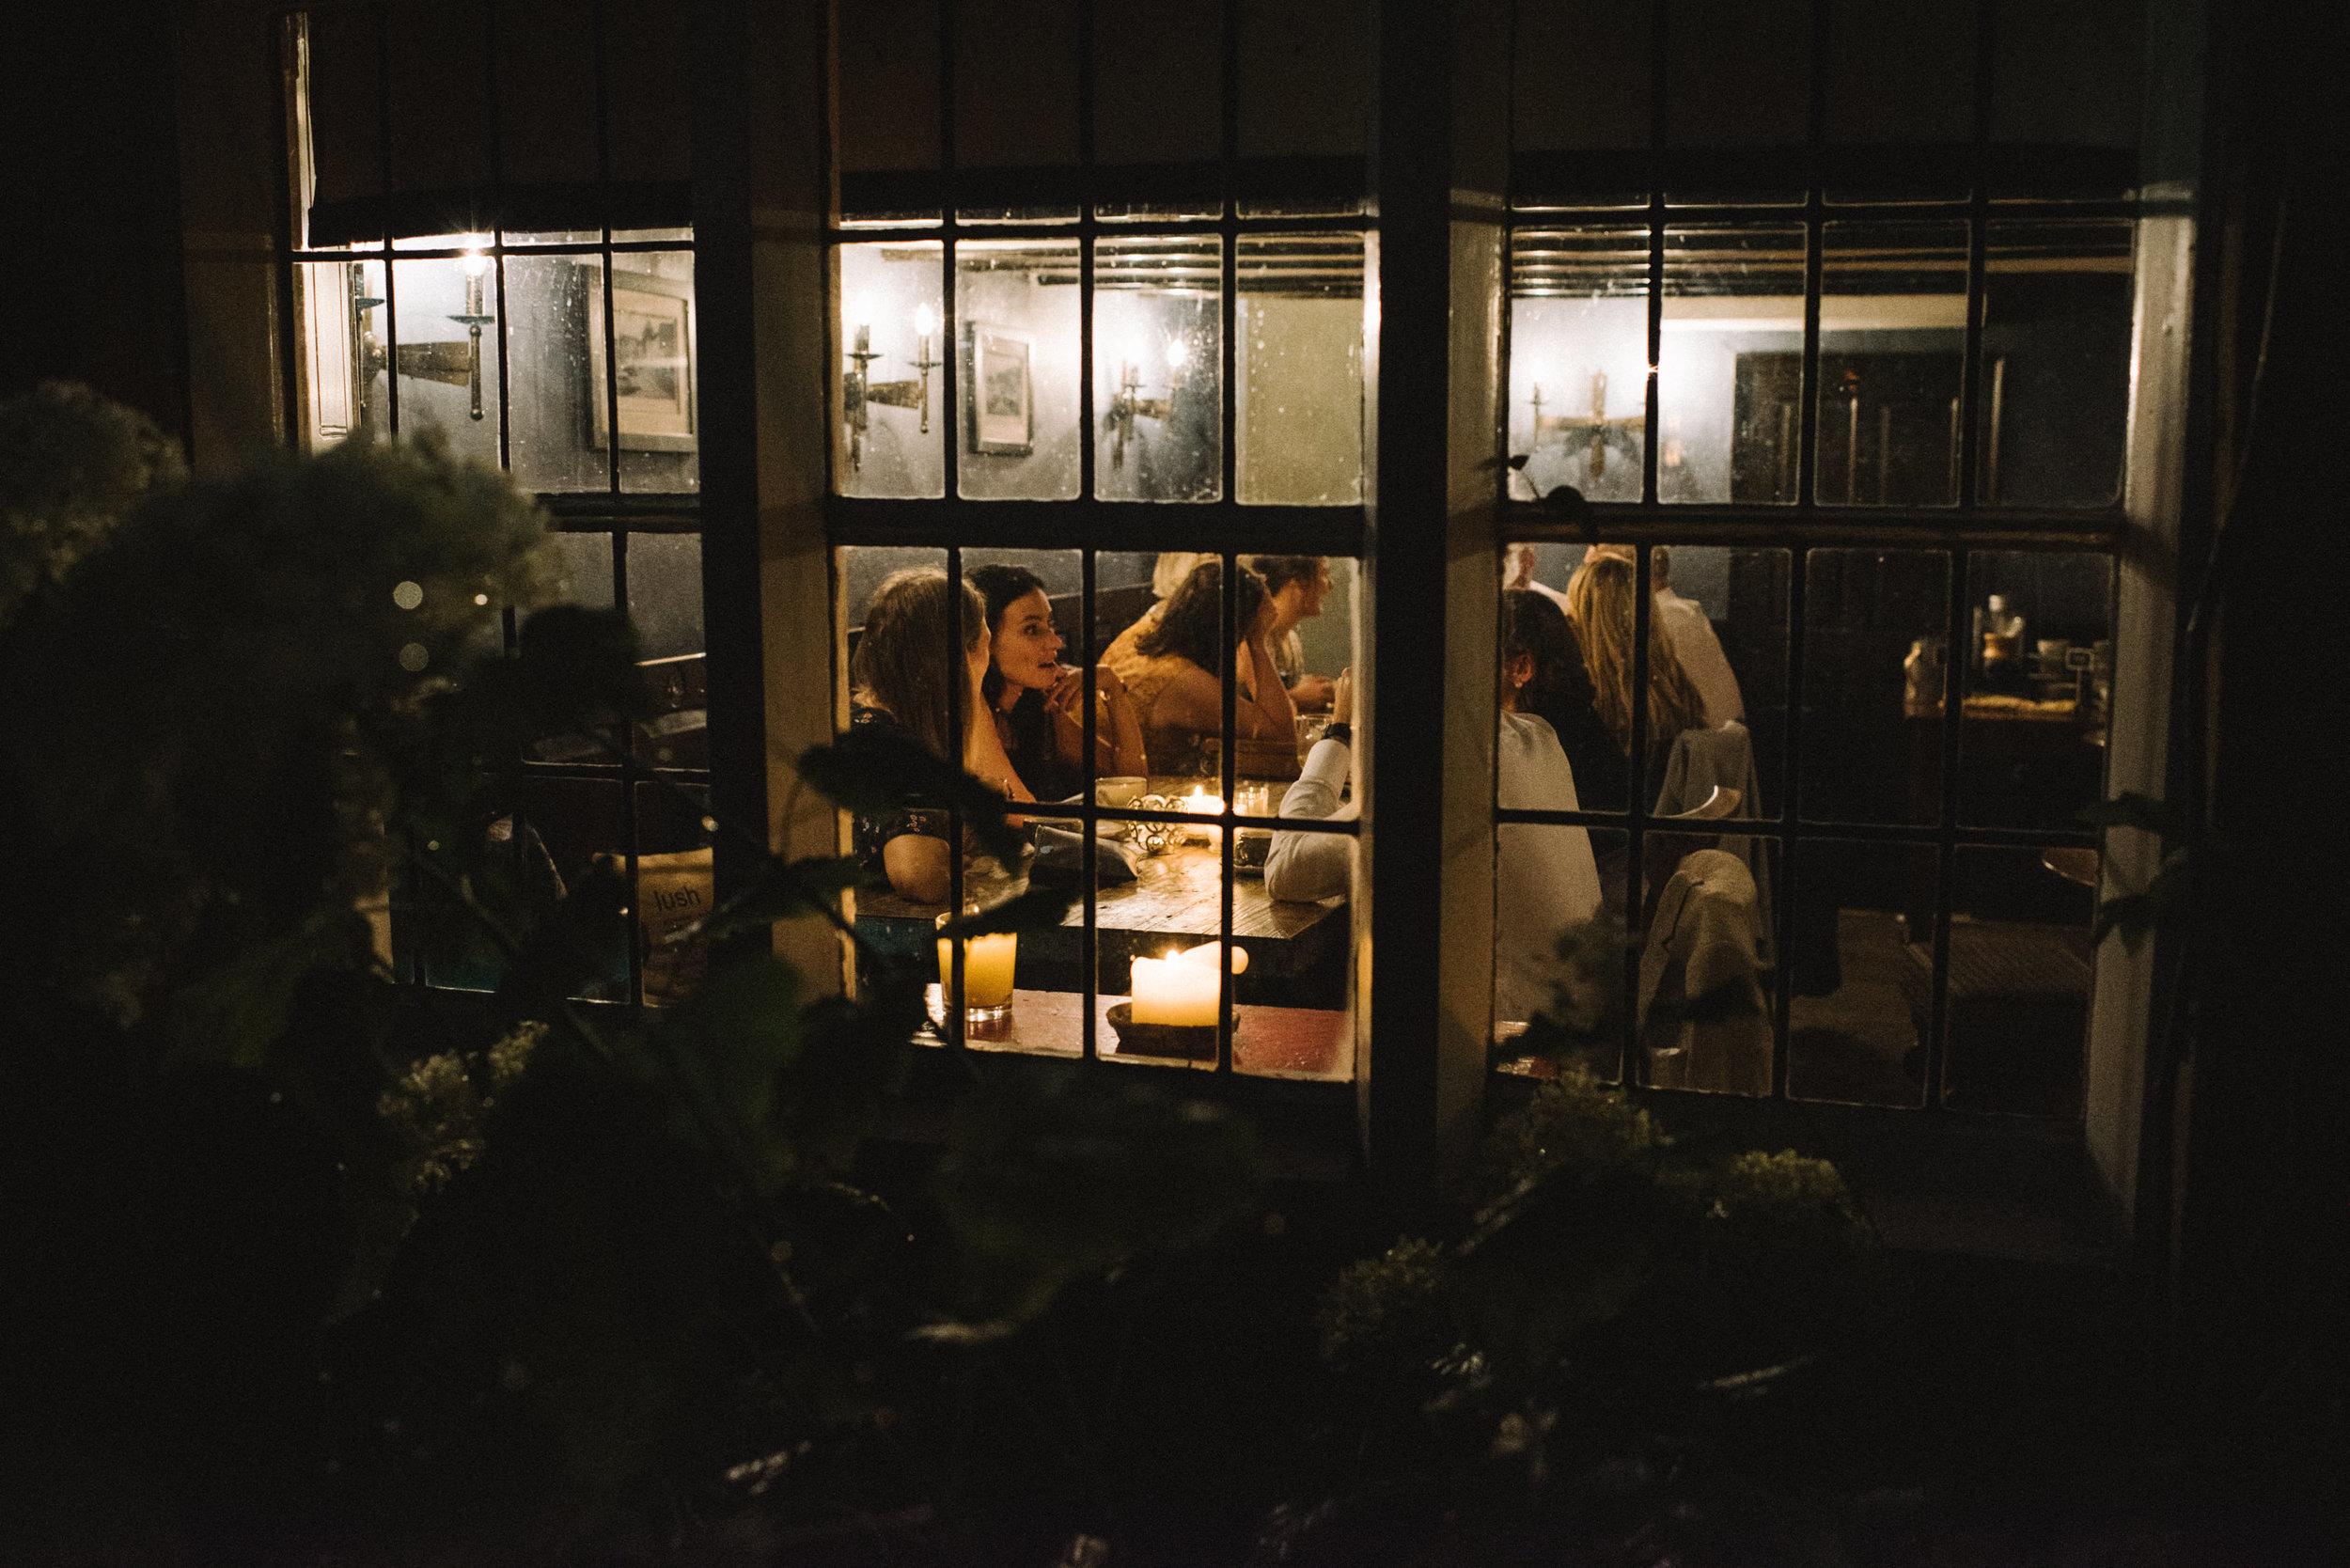 0144-LISA-DEVINE-PHOTOGRAPHY-ALTERNATIVE-WEDDING-PHOTOGRAPHY-SCOTLAND-DESTINATION-WEDDINGS-GLASGOW-WEDDINGS-COOL-WEDDINGS-STYLISH-WEDDINGS.JPG